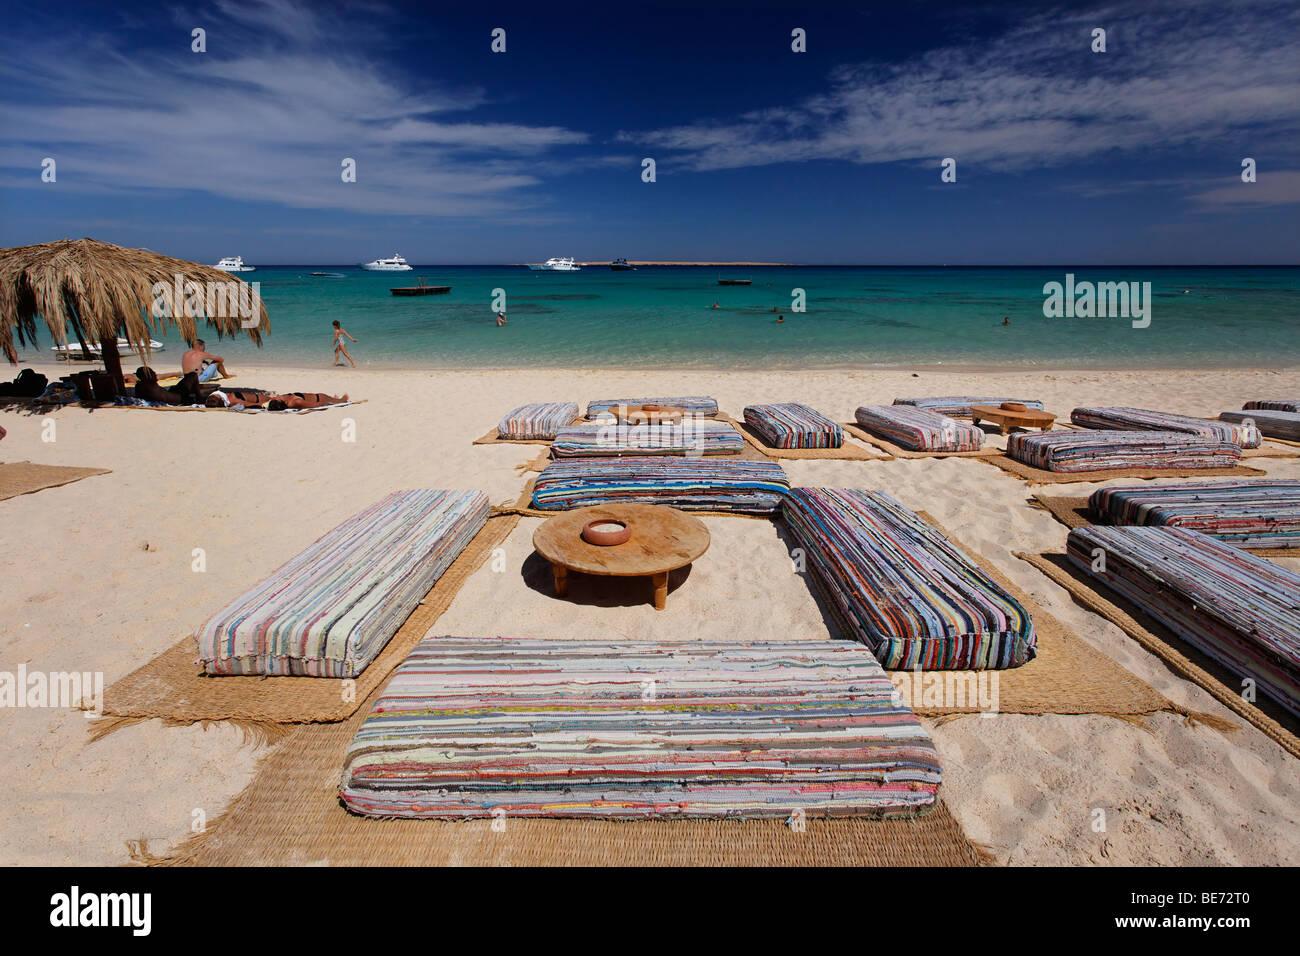 Kissen, Sitze, Sonnenschirm, Strand, Lagune, Horizont Mahmya, Giftun Insel, Hurghada, Ägypten, Afrika, Rotes Stockbild